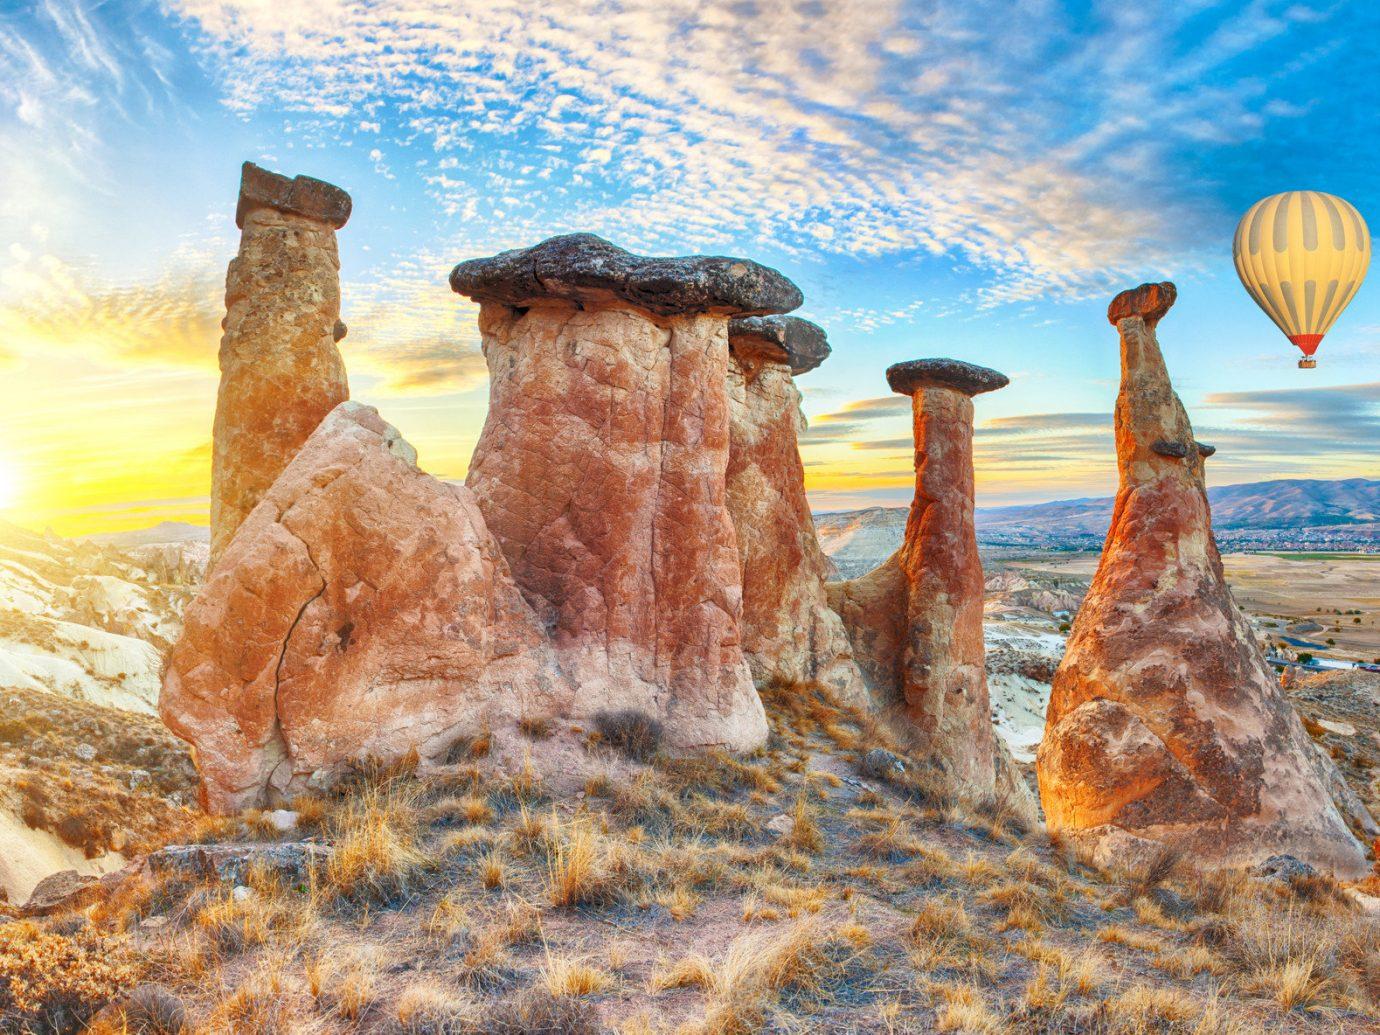 Offbeat Trip Ideas outdoor natural environment wilderness canyon season rock landscape sunlight formation autumn terrain